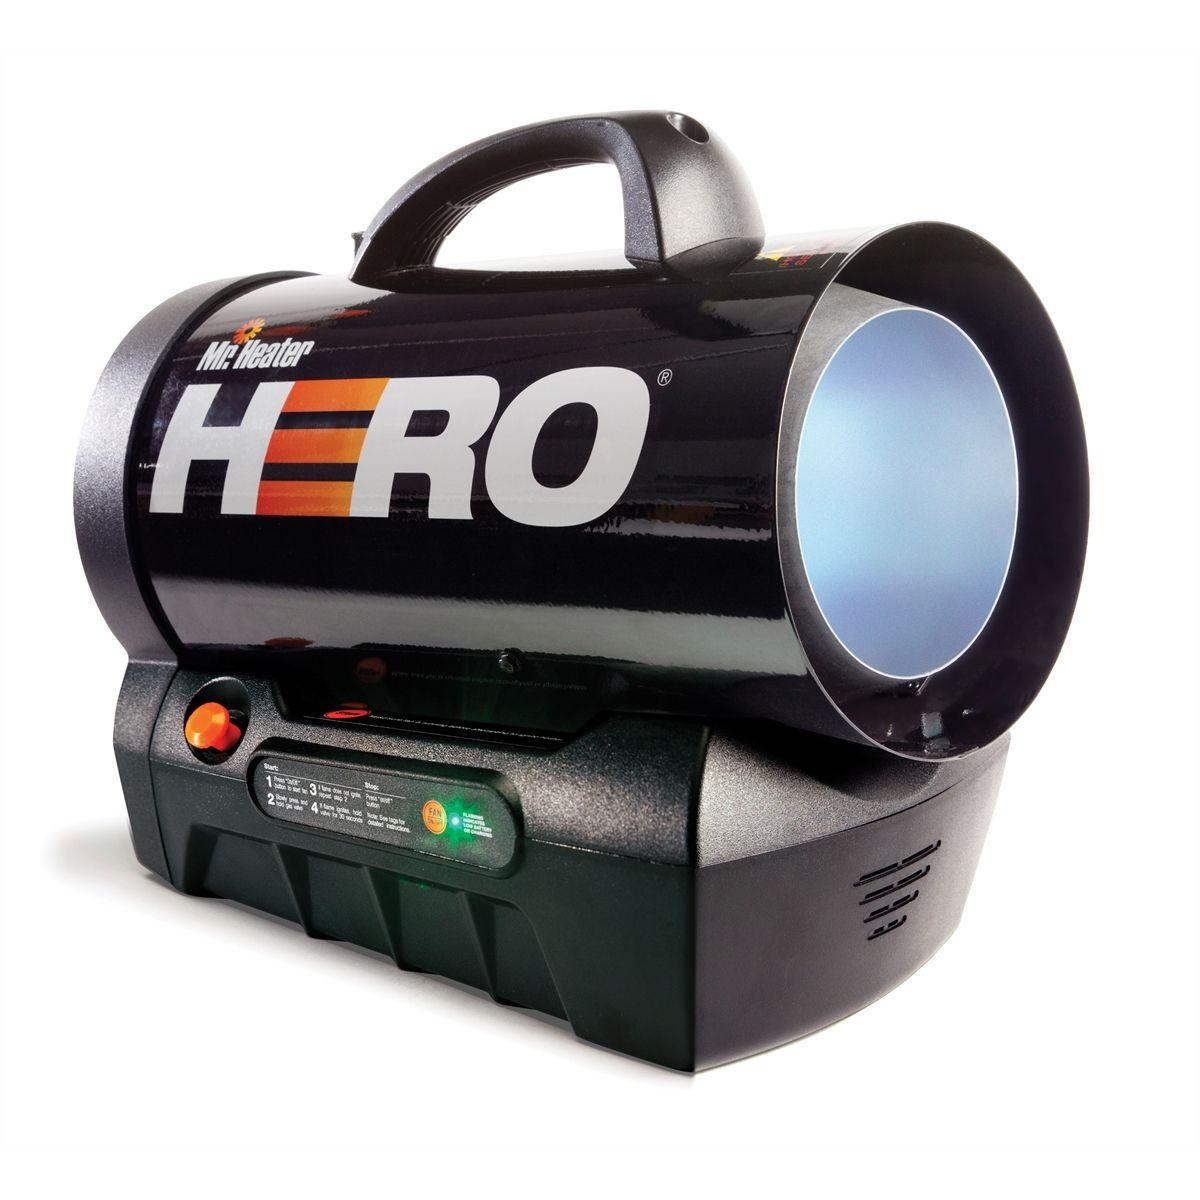 Forced Air Propane Heater >> Mh35clp Hero Cordless Forced Air Propane Heater 35 000 Btu Mr